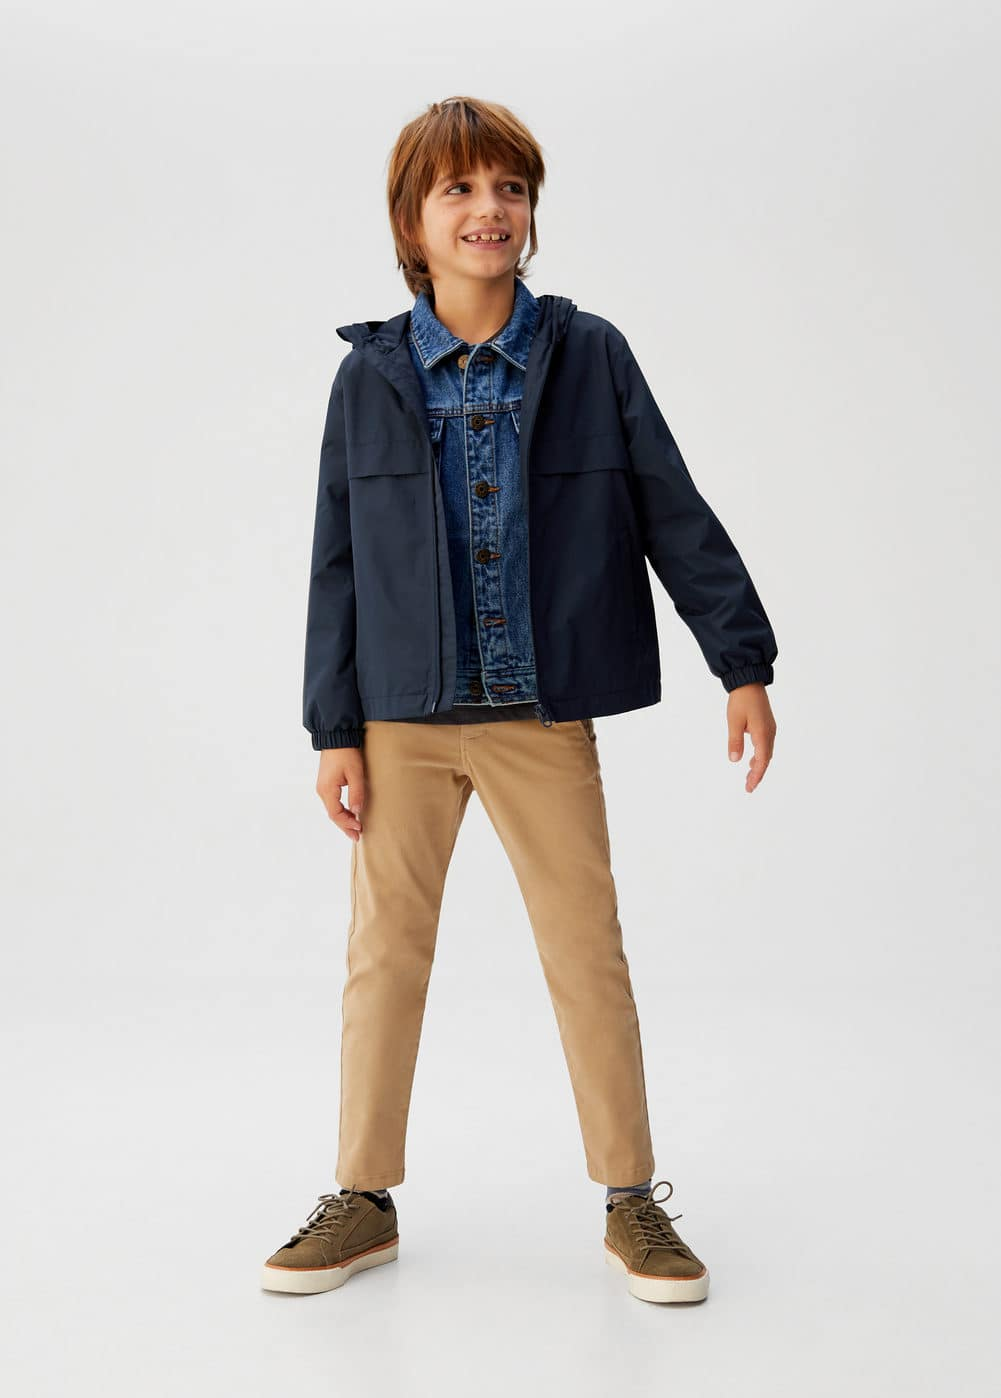 o-chicago6:chaqueta impermeable capucha